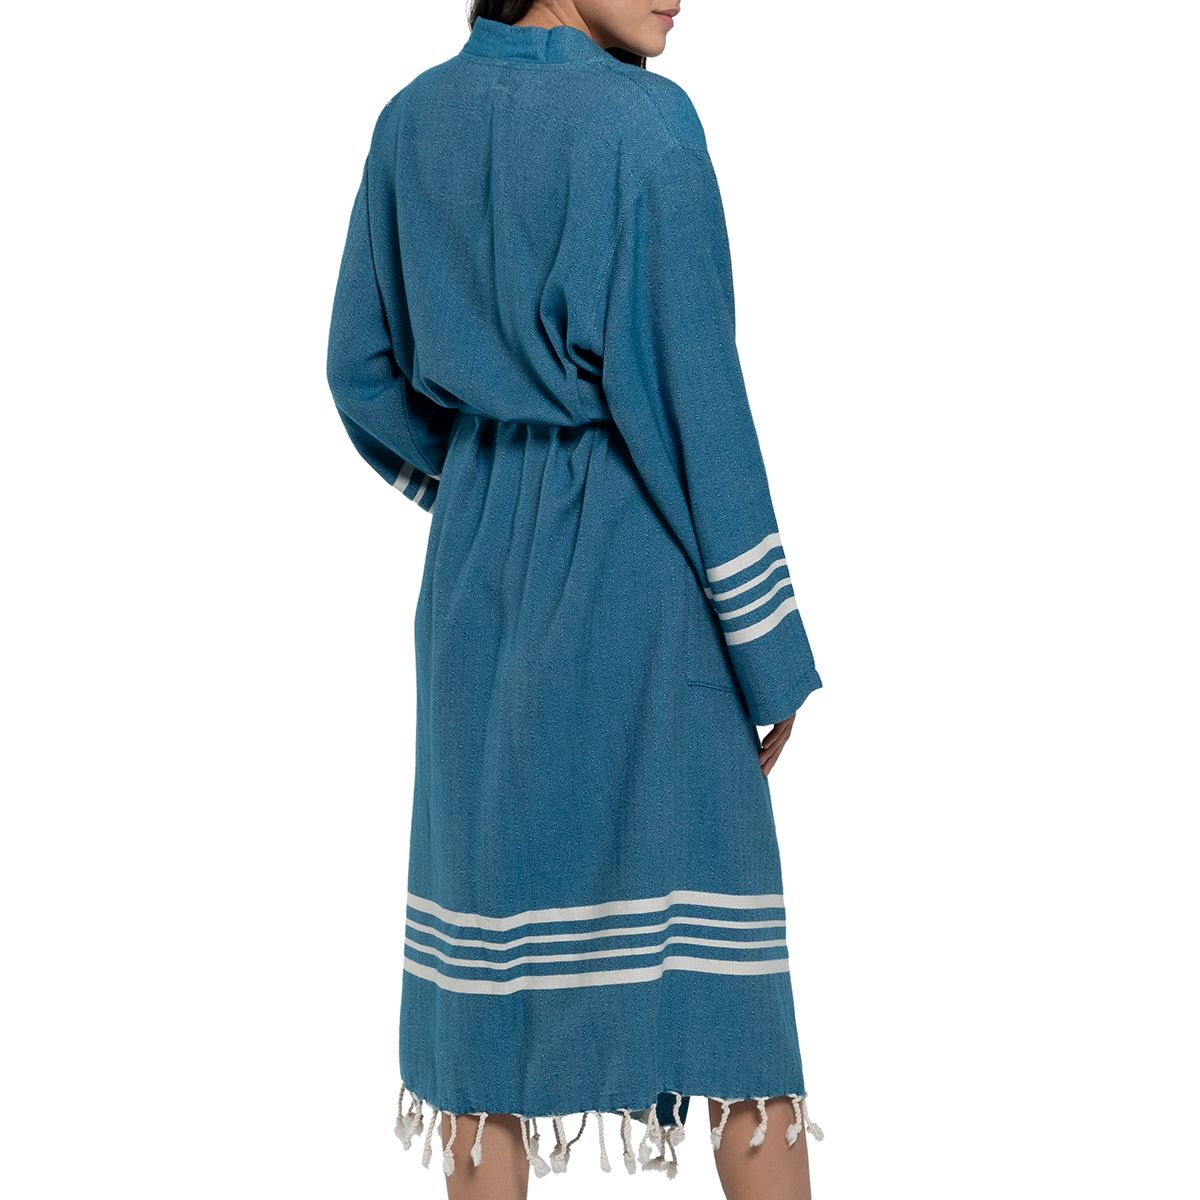 Bathrobe Sultan kimono collar - Petrol Blue